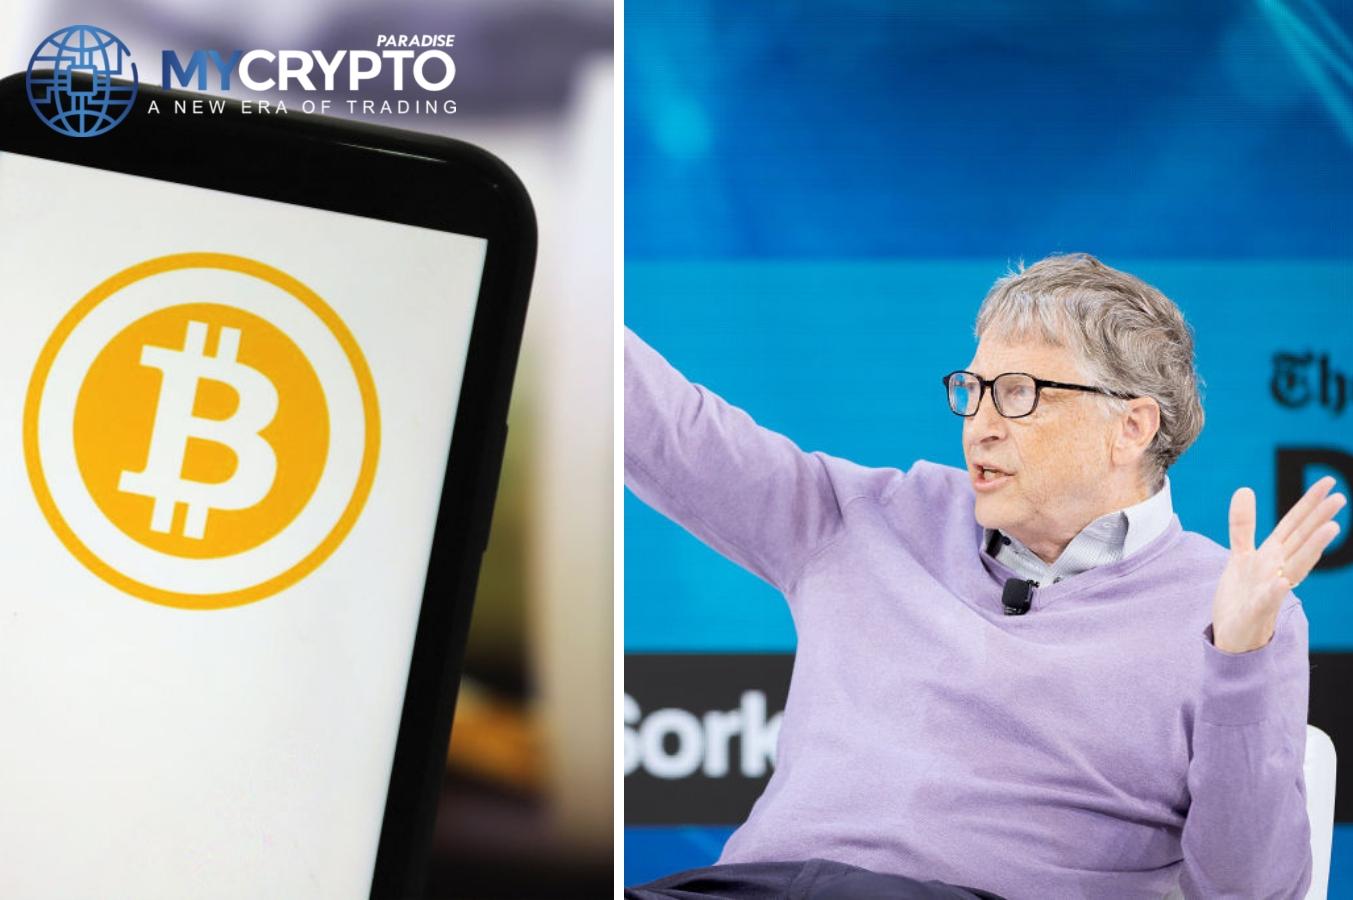 Bill Gates takes a 'Neutral' view on Bitcoin